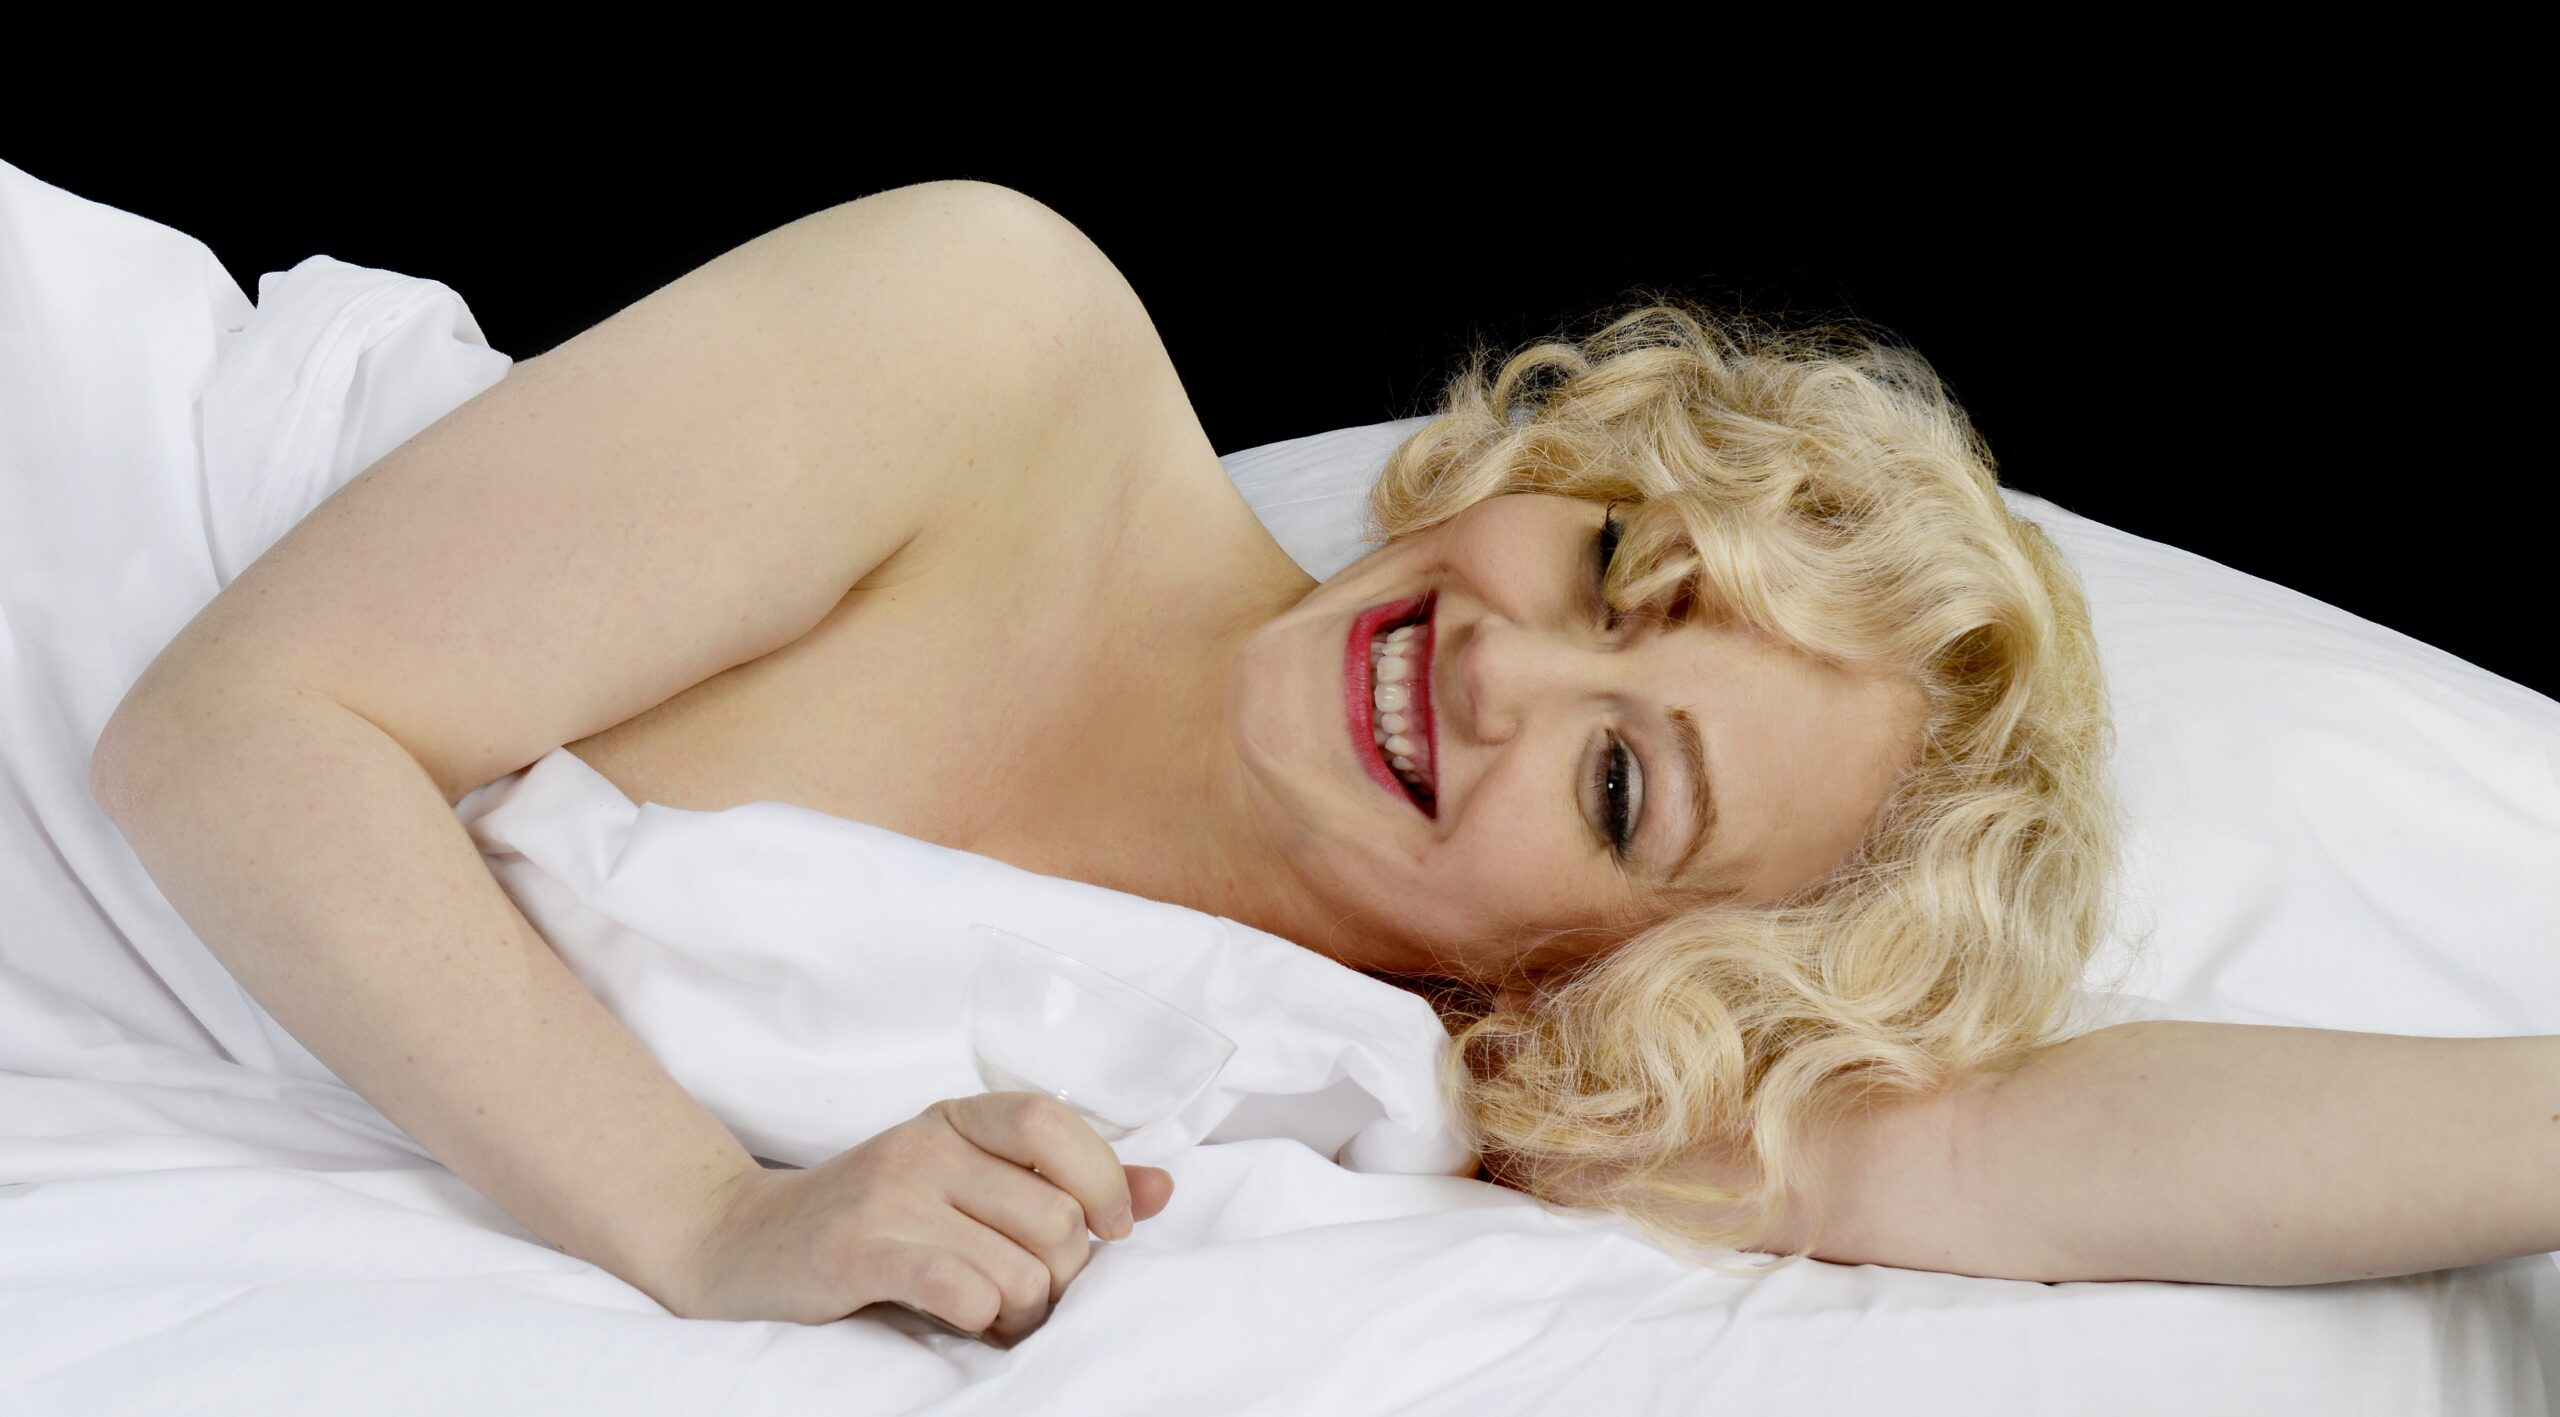 The Unremarkable Death of Marilyn Monroe